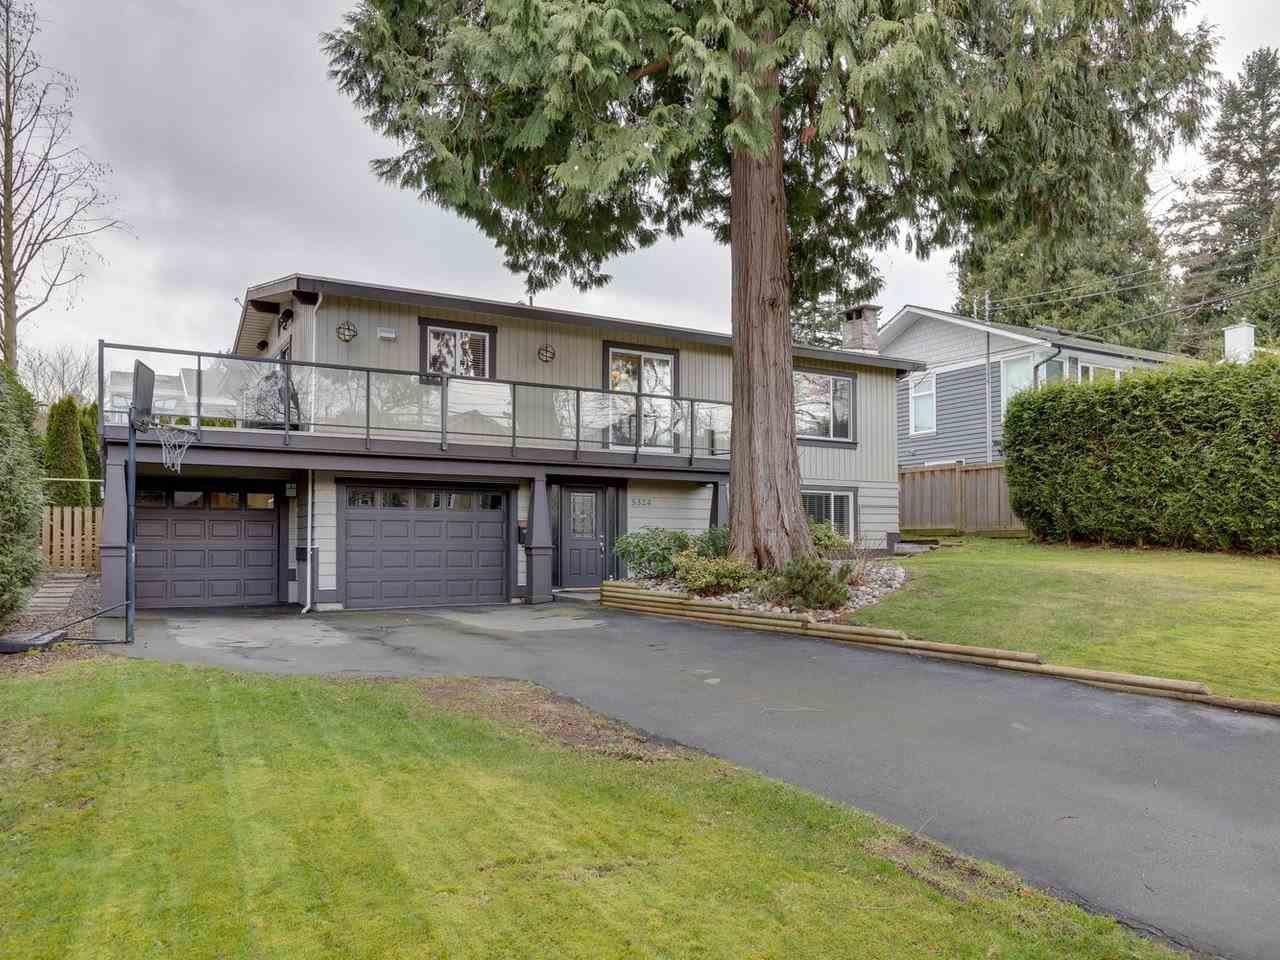 Main Photo: 5324 6 Avenue in Delta: Pebble Hill House for sale (Tsawwassen)  : MLS®# R2537670